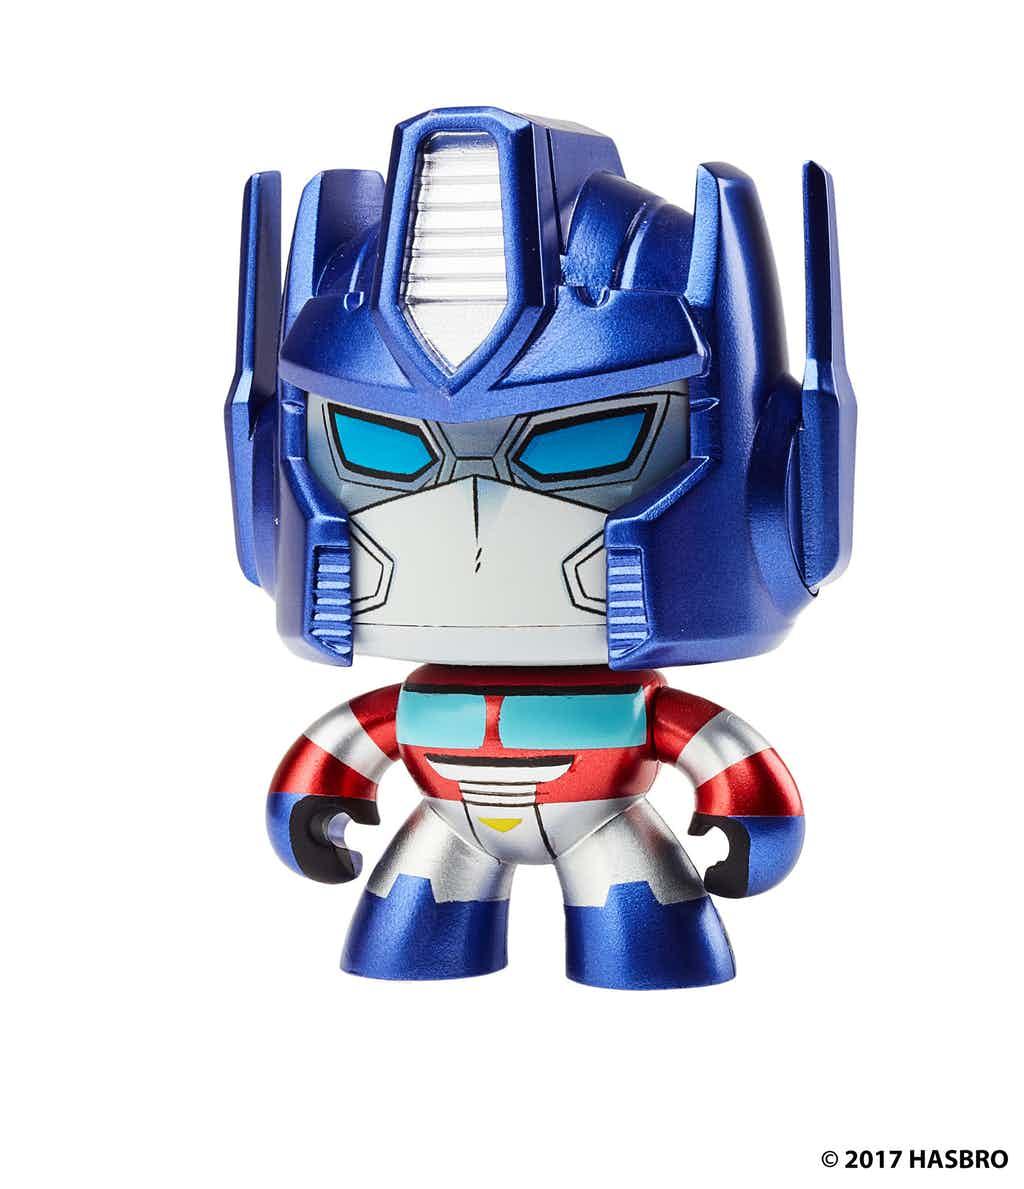 Hasbro mighty mugg customs, auctions, tutorials & more! — custom.